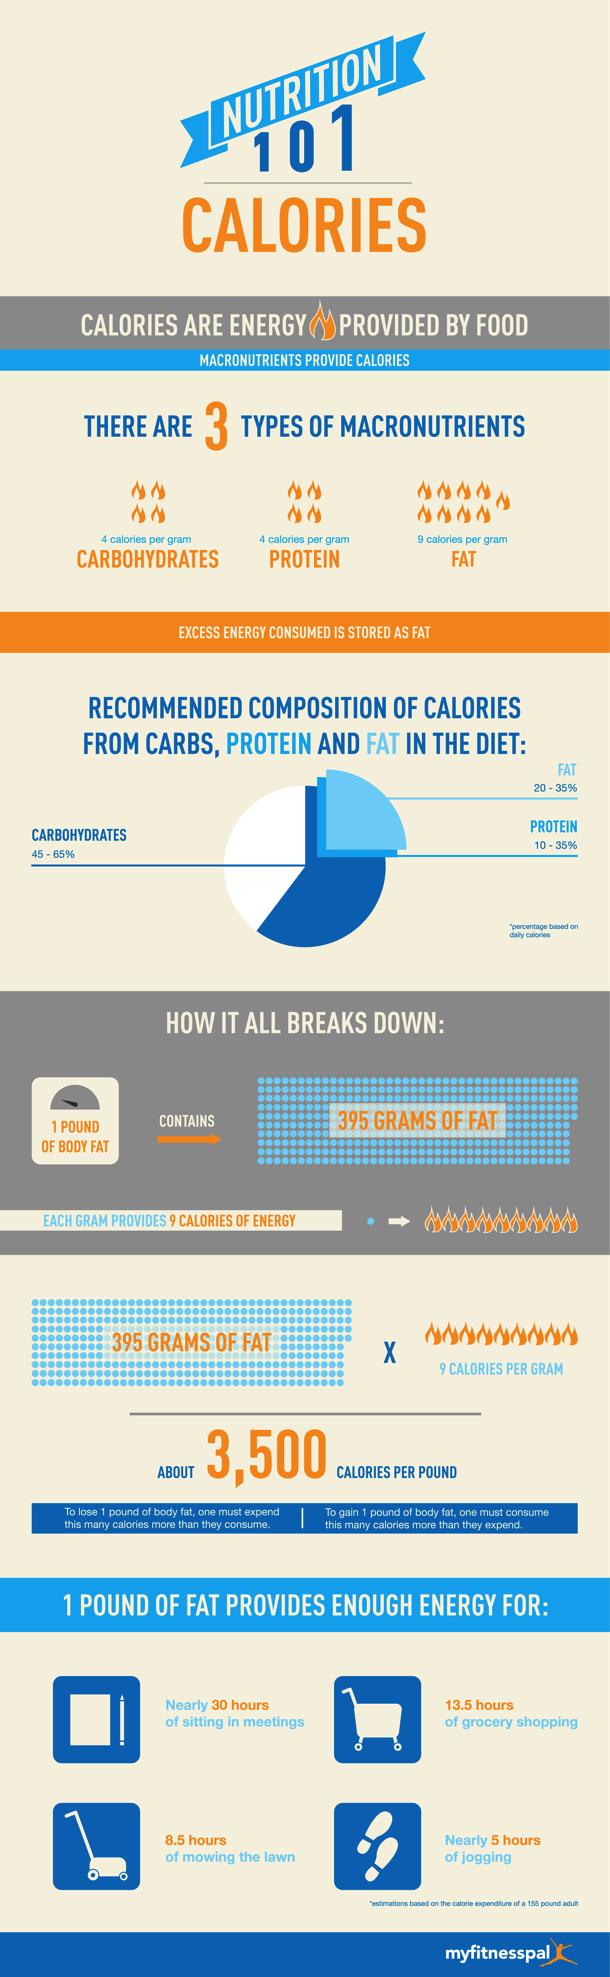 Calorie Consumption and Nutrition